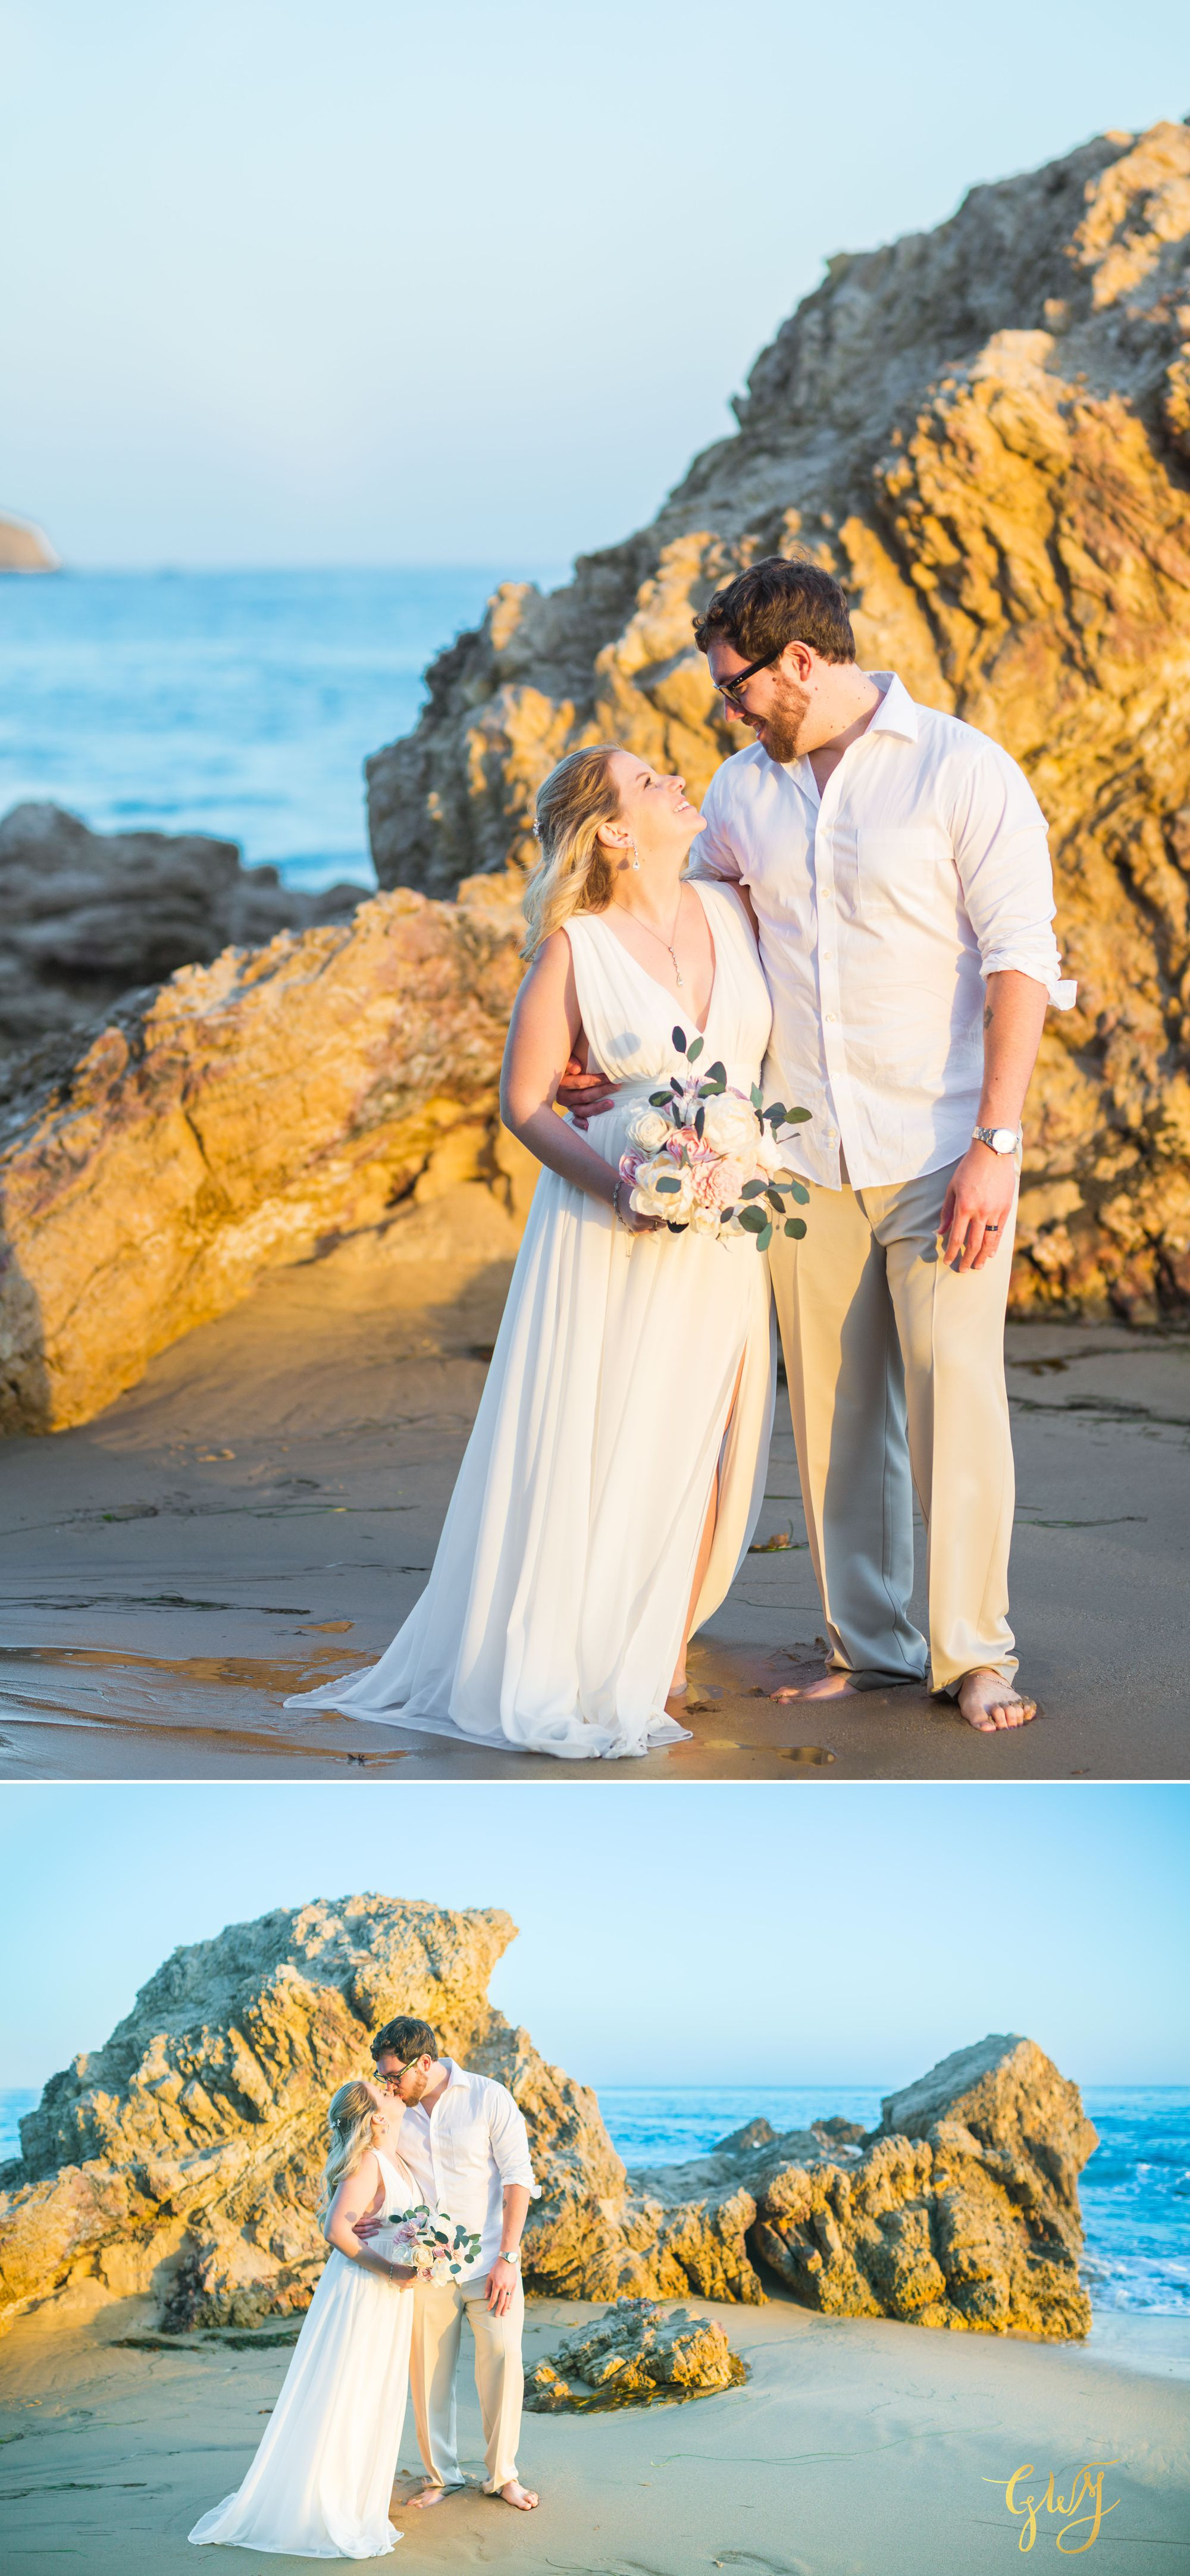 Amanda + Joe Reef Point Crystal Cove Newport Beach Sunset Romantic Intimate Elopement by Glass Woods Media 14.jpg